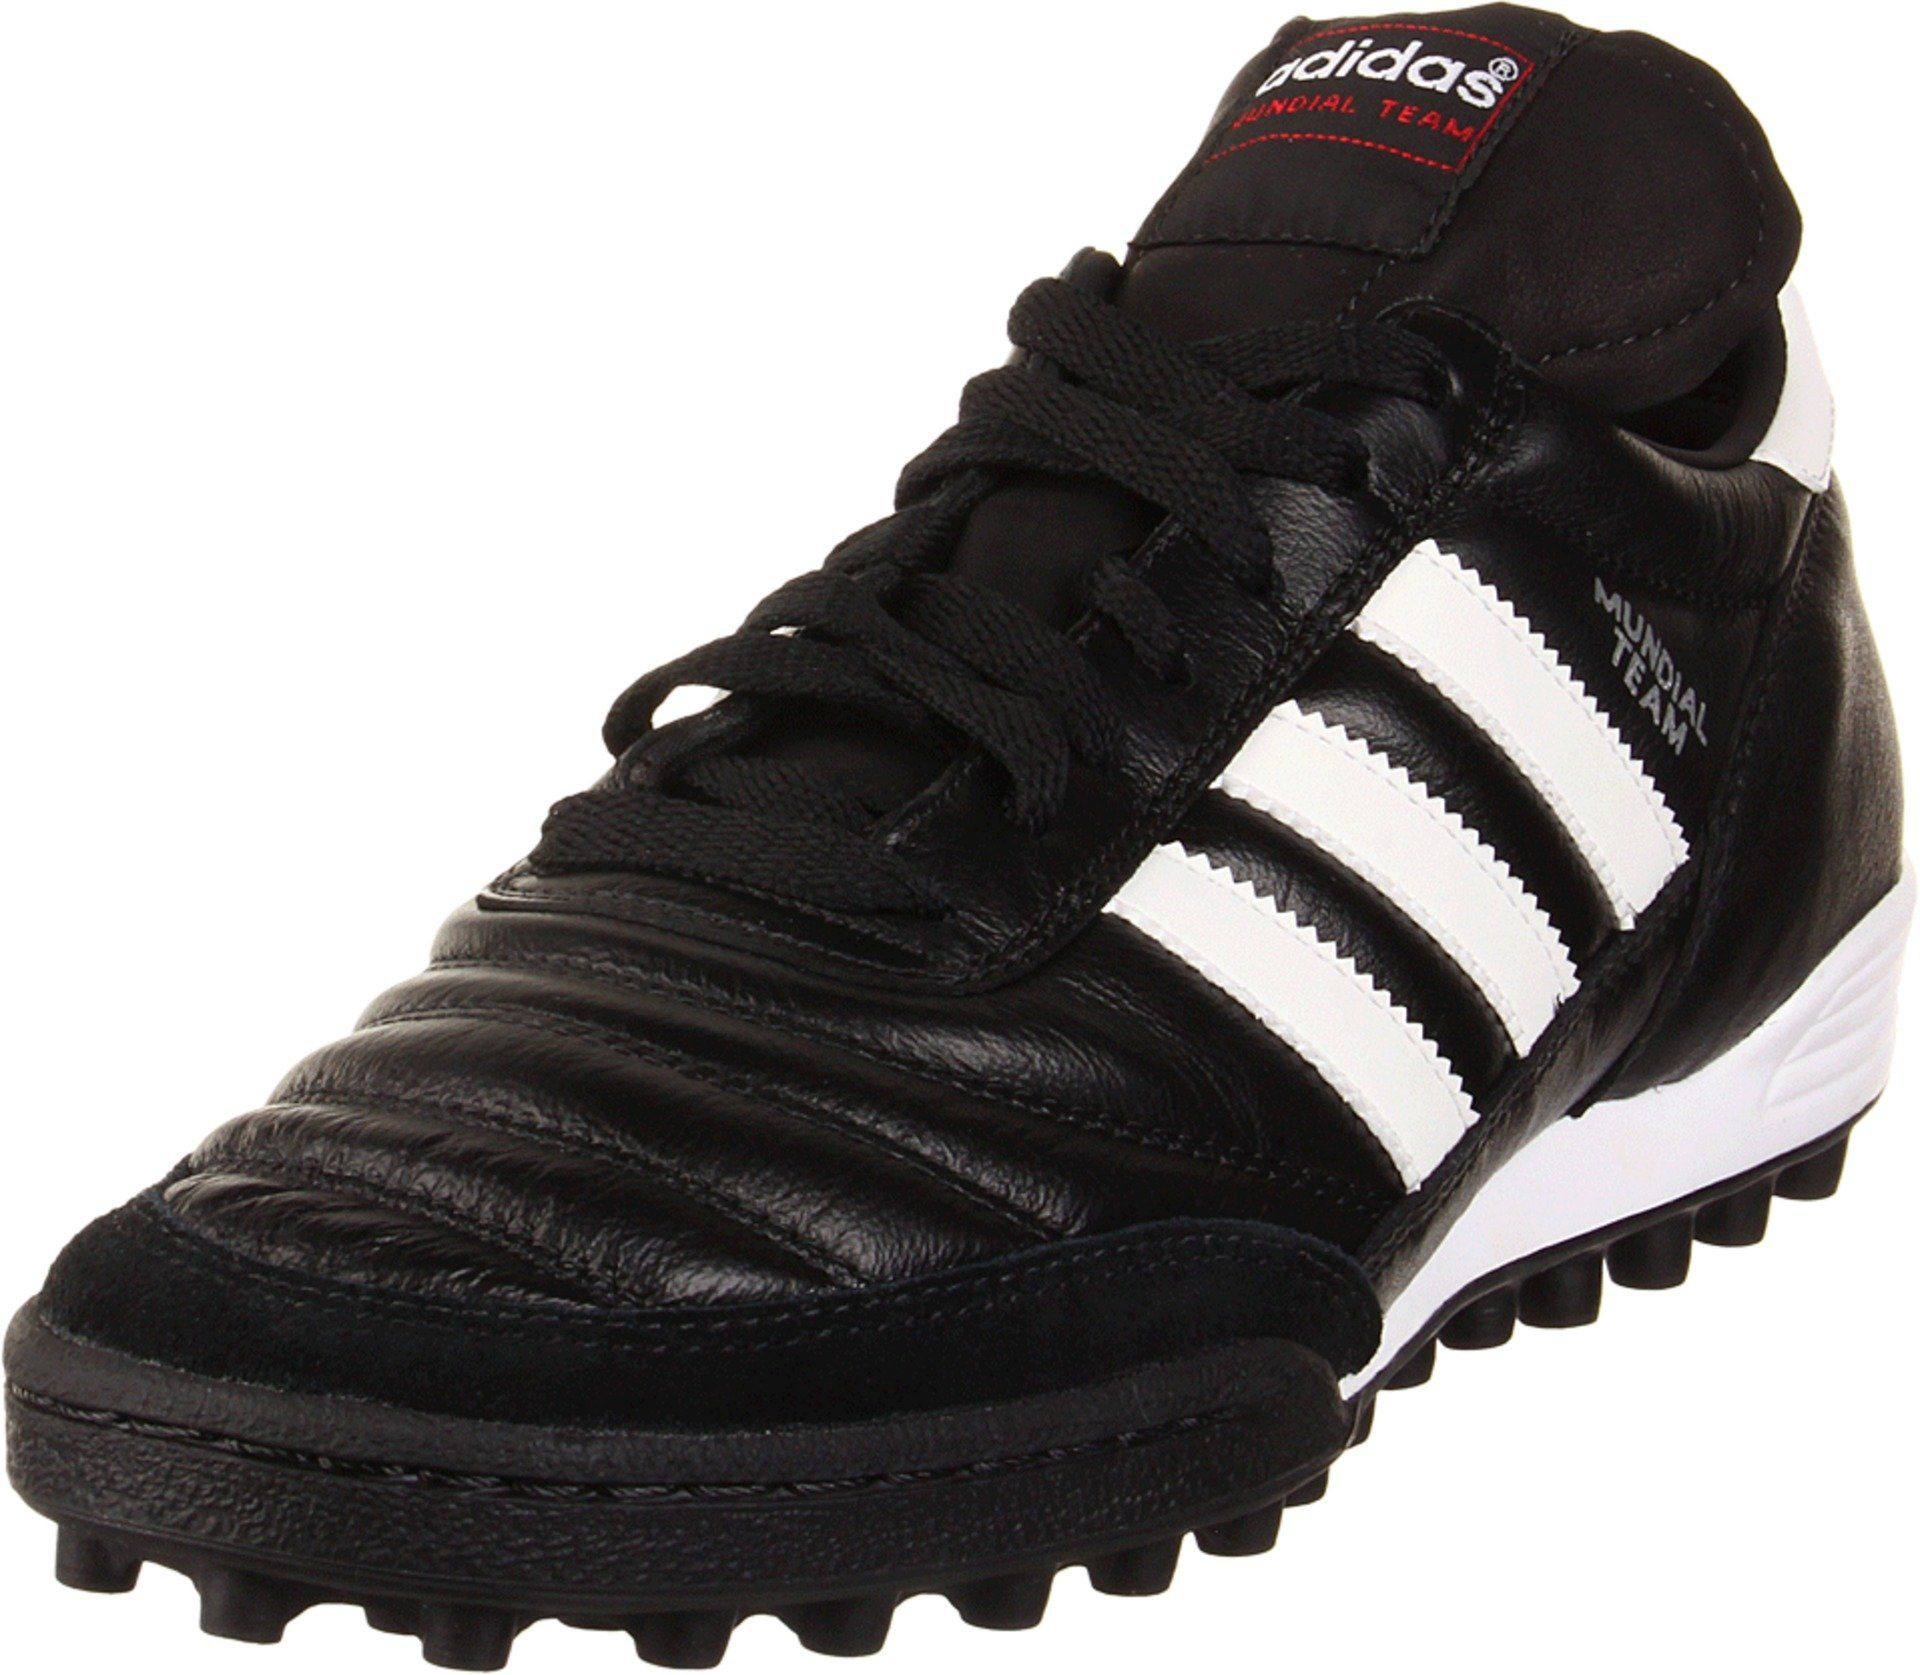 21d4f02ebf6a6 Amazon.com: adidas Men's Mundial Team Soccer Shoe: Clothing | Shoes ...